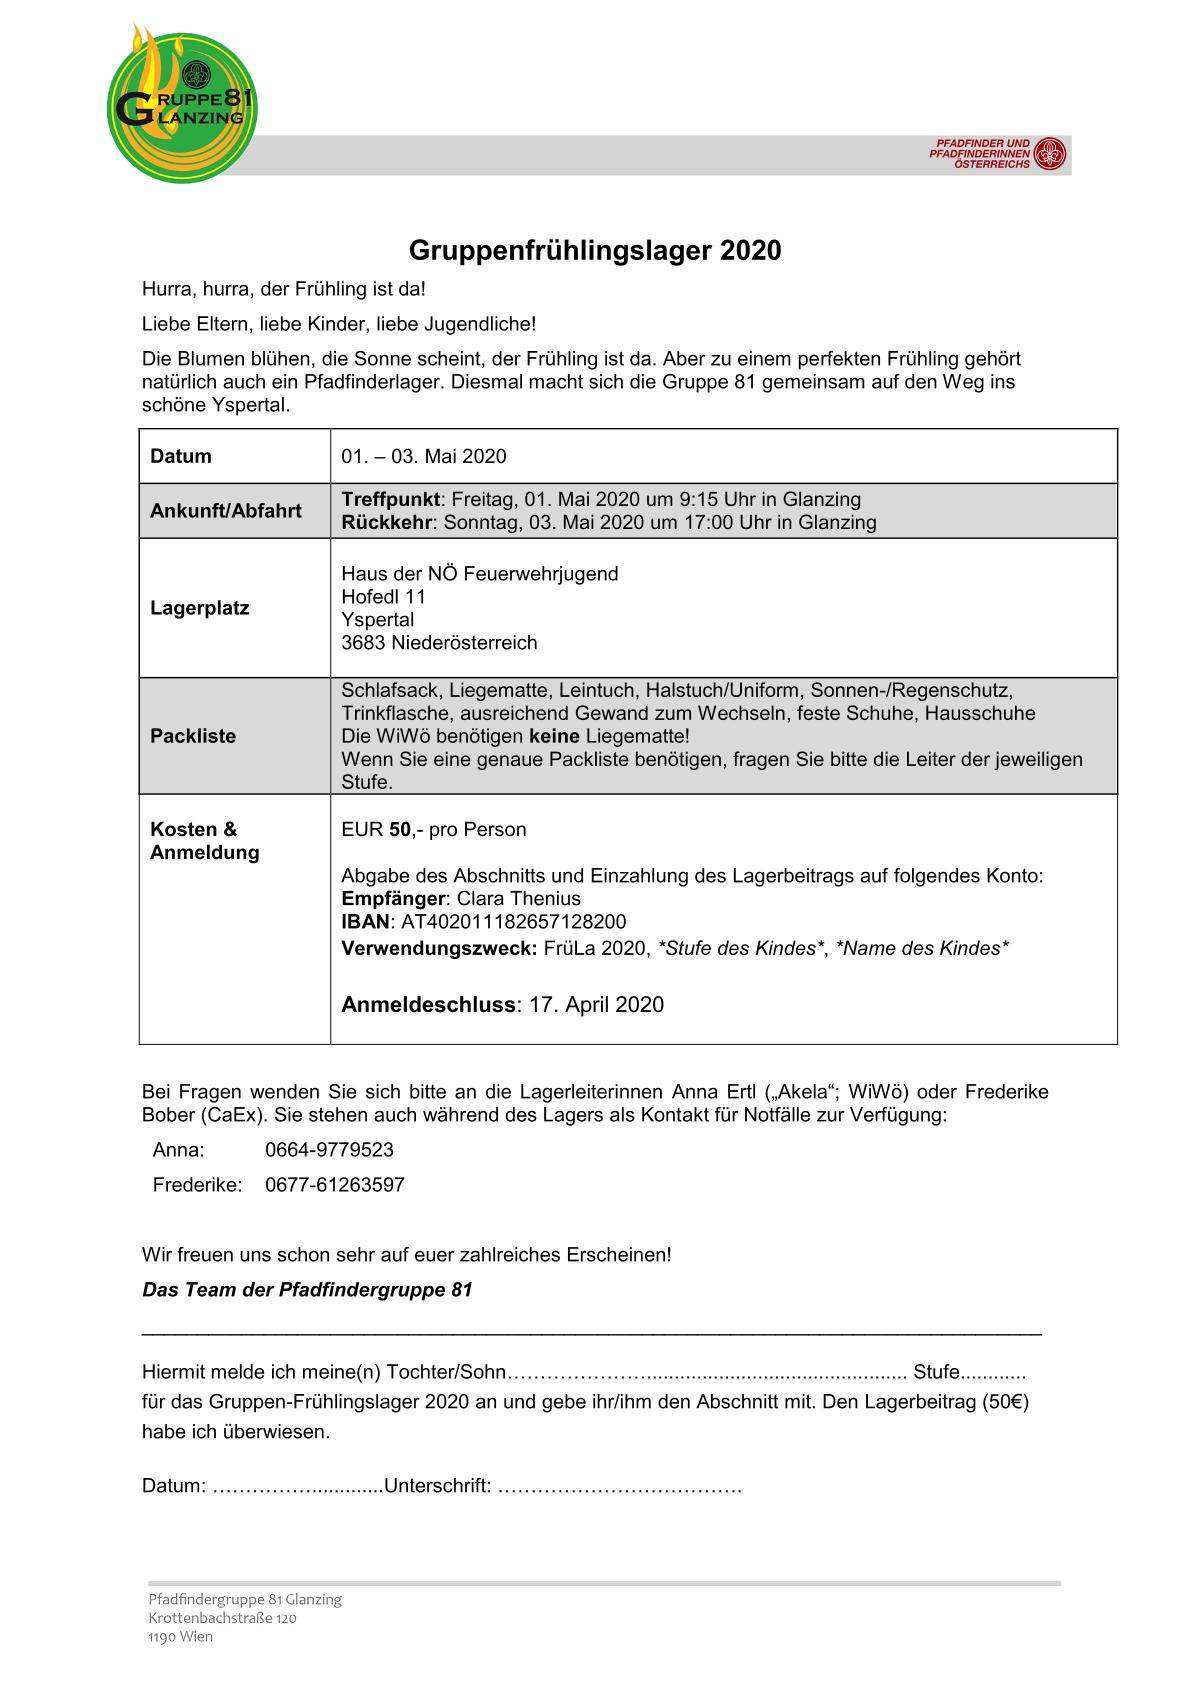 Gruppenfrühlingslager 1.-3.5.2020